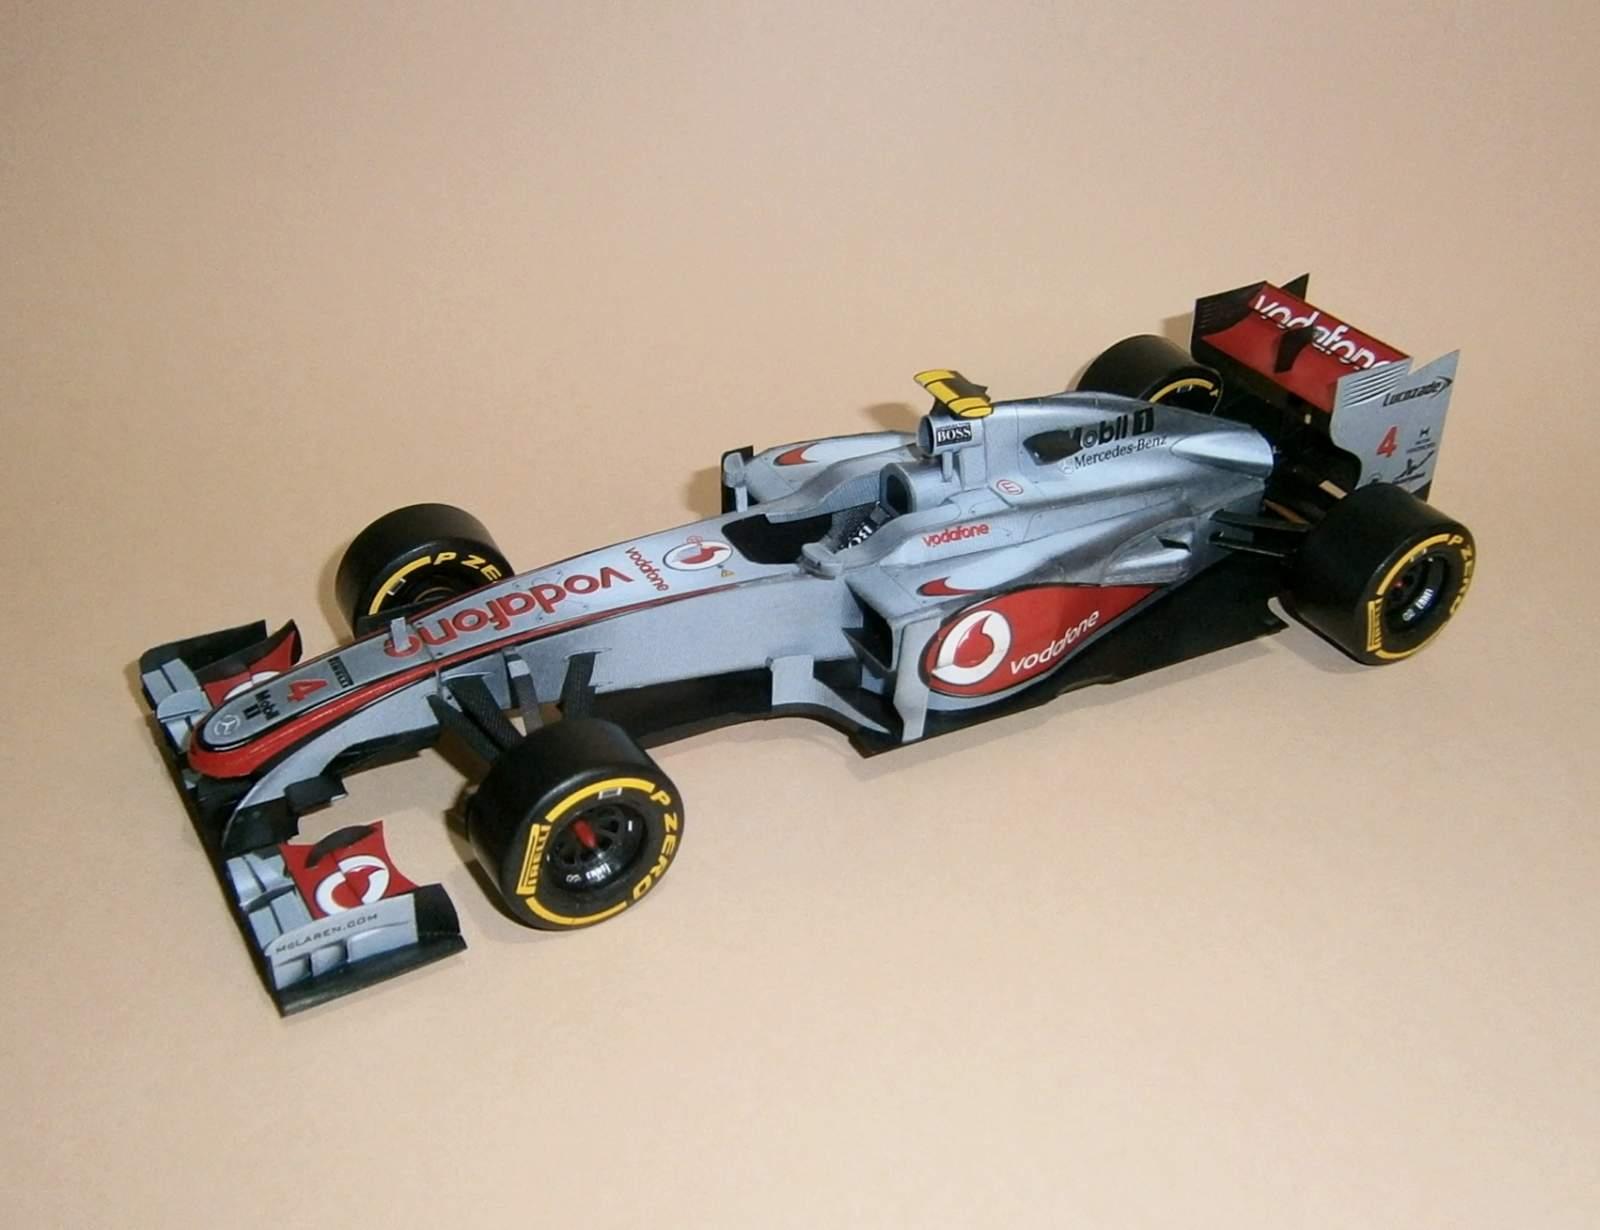 McLaren MP4-27 - L.Hamilton 2012